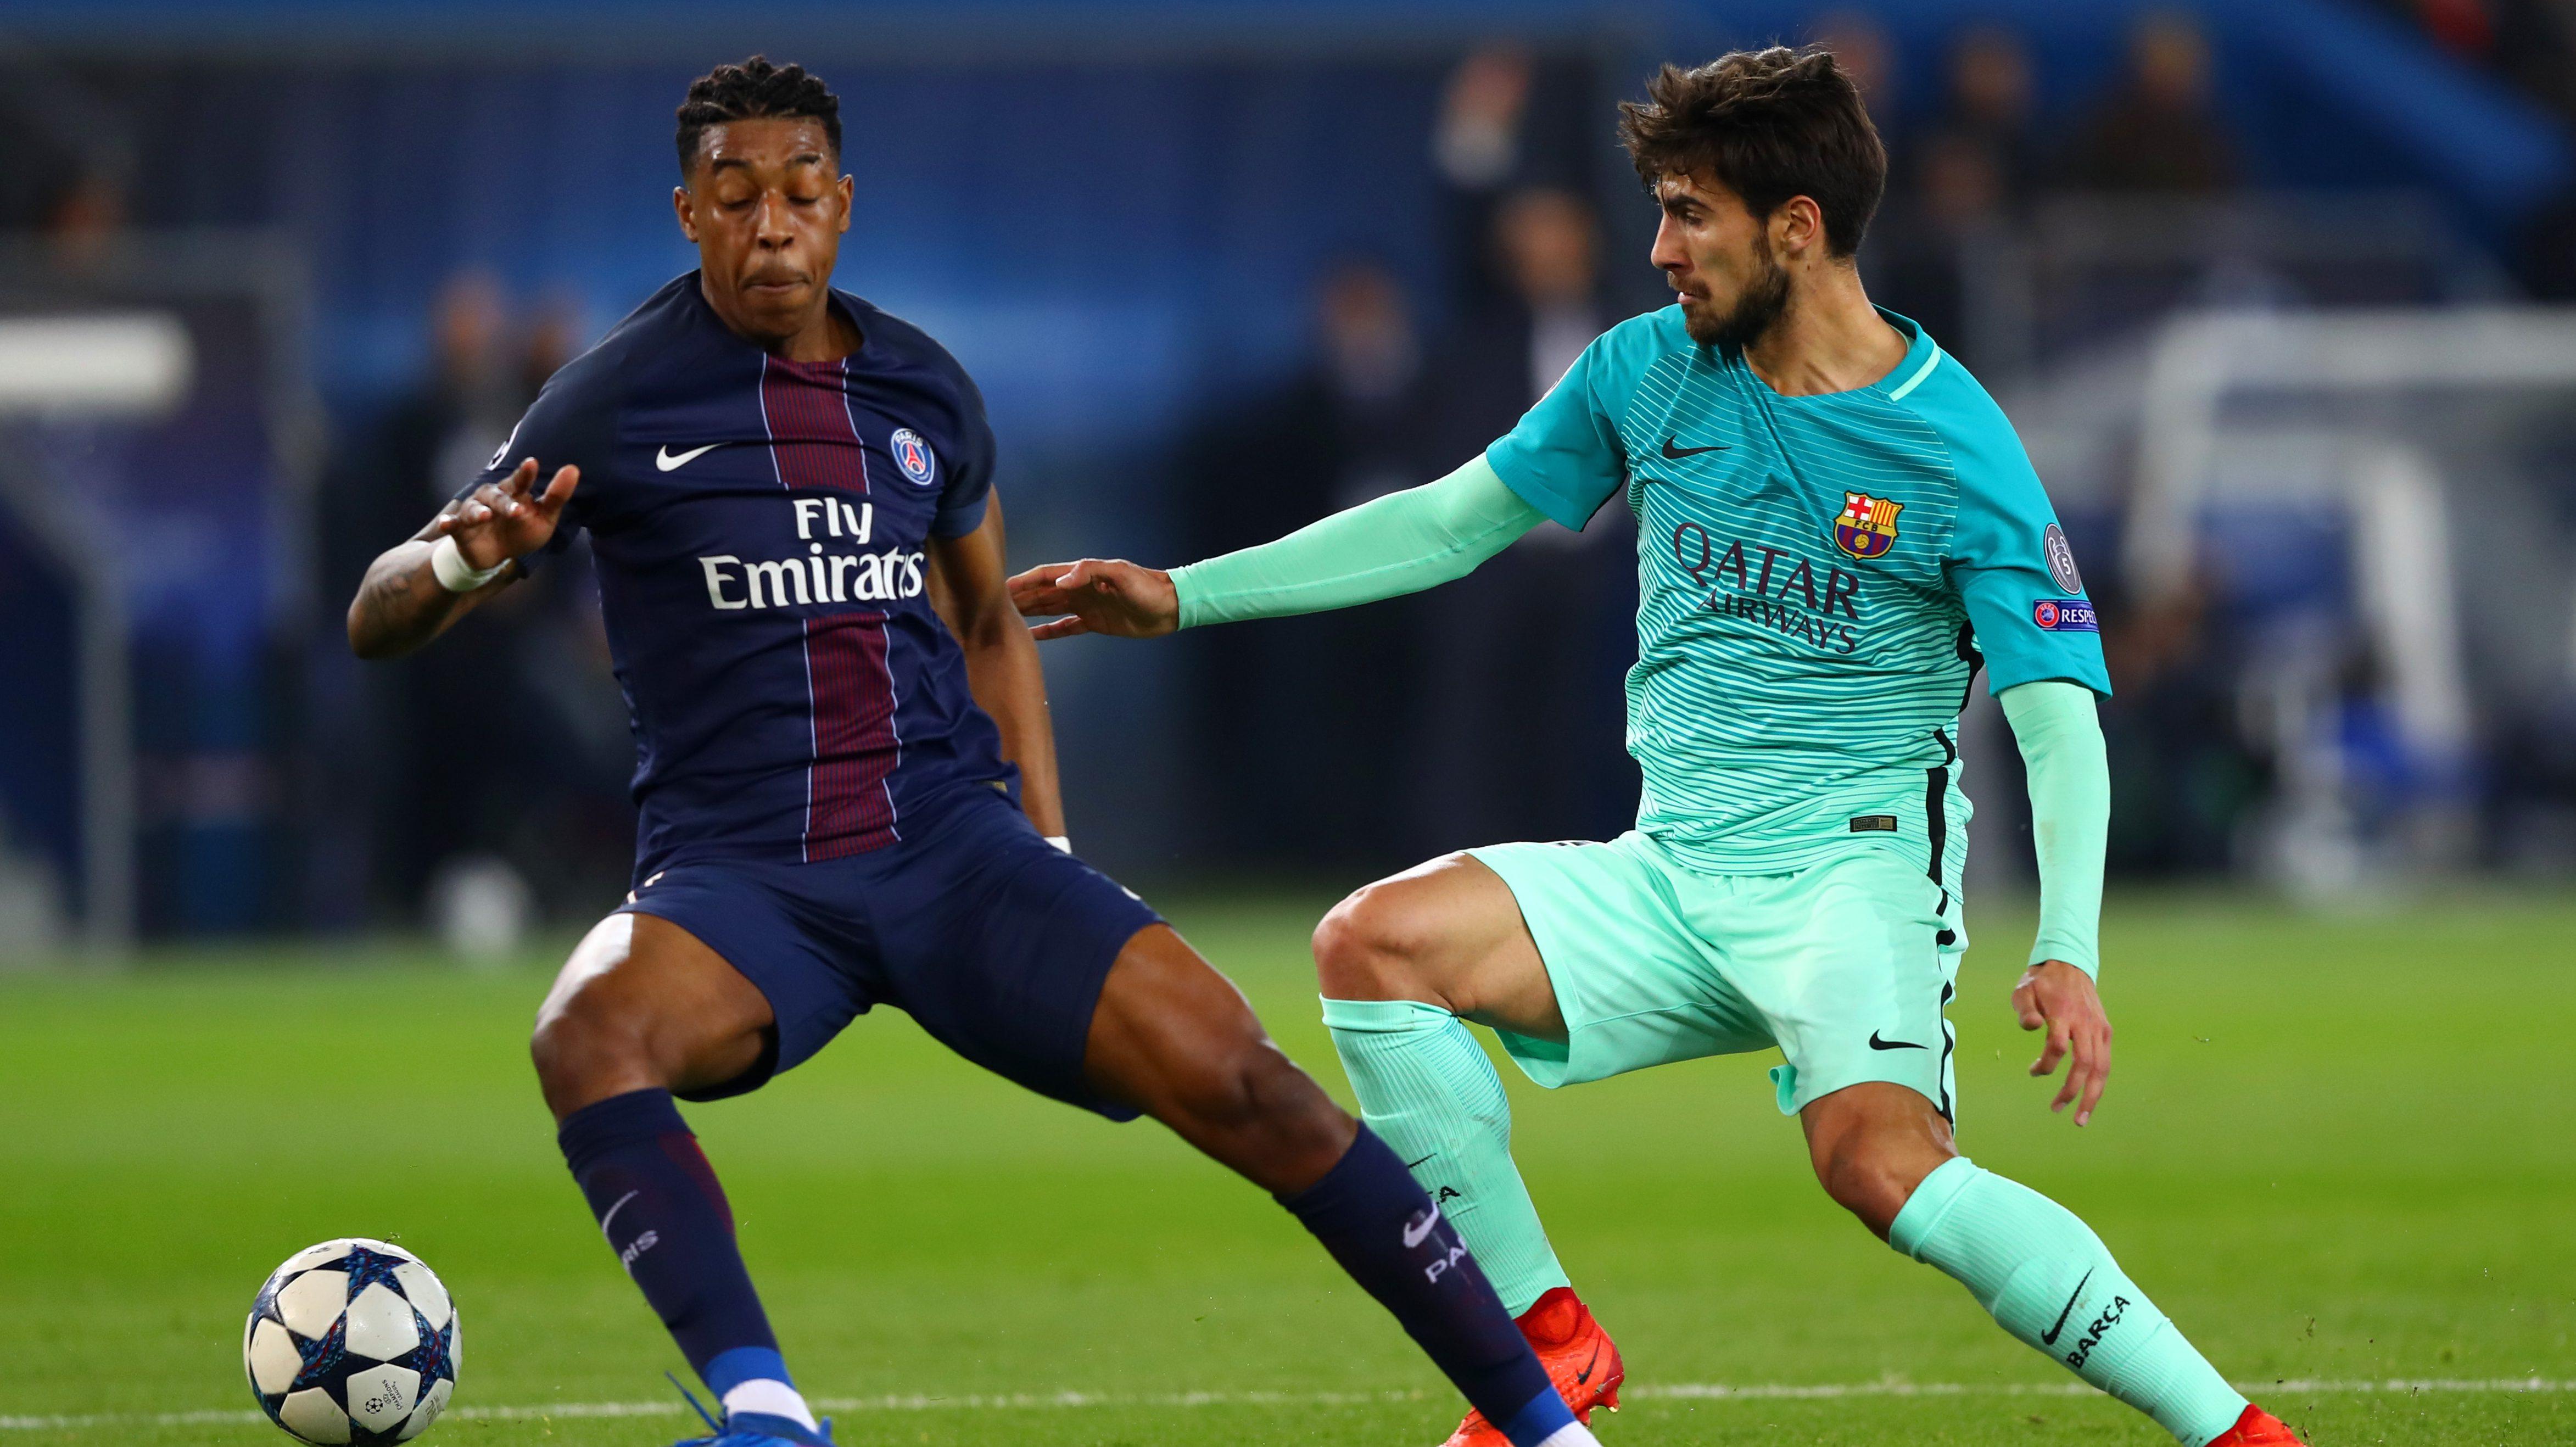 Barcelona vs. PSG: Score Updates & Highlights | Heavy.com